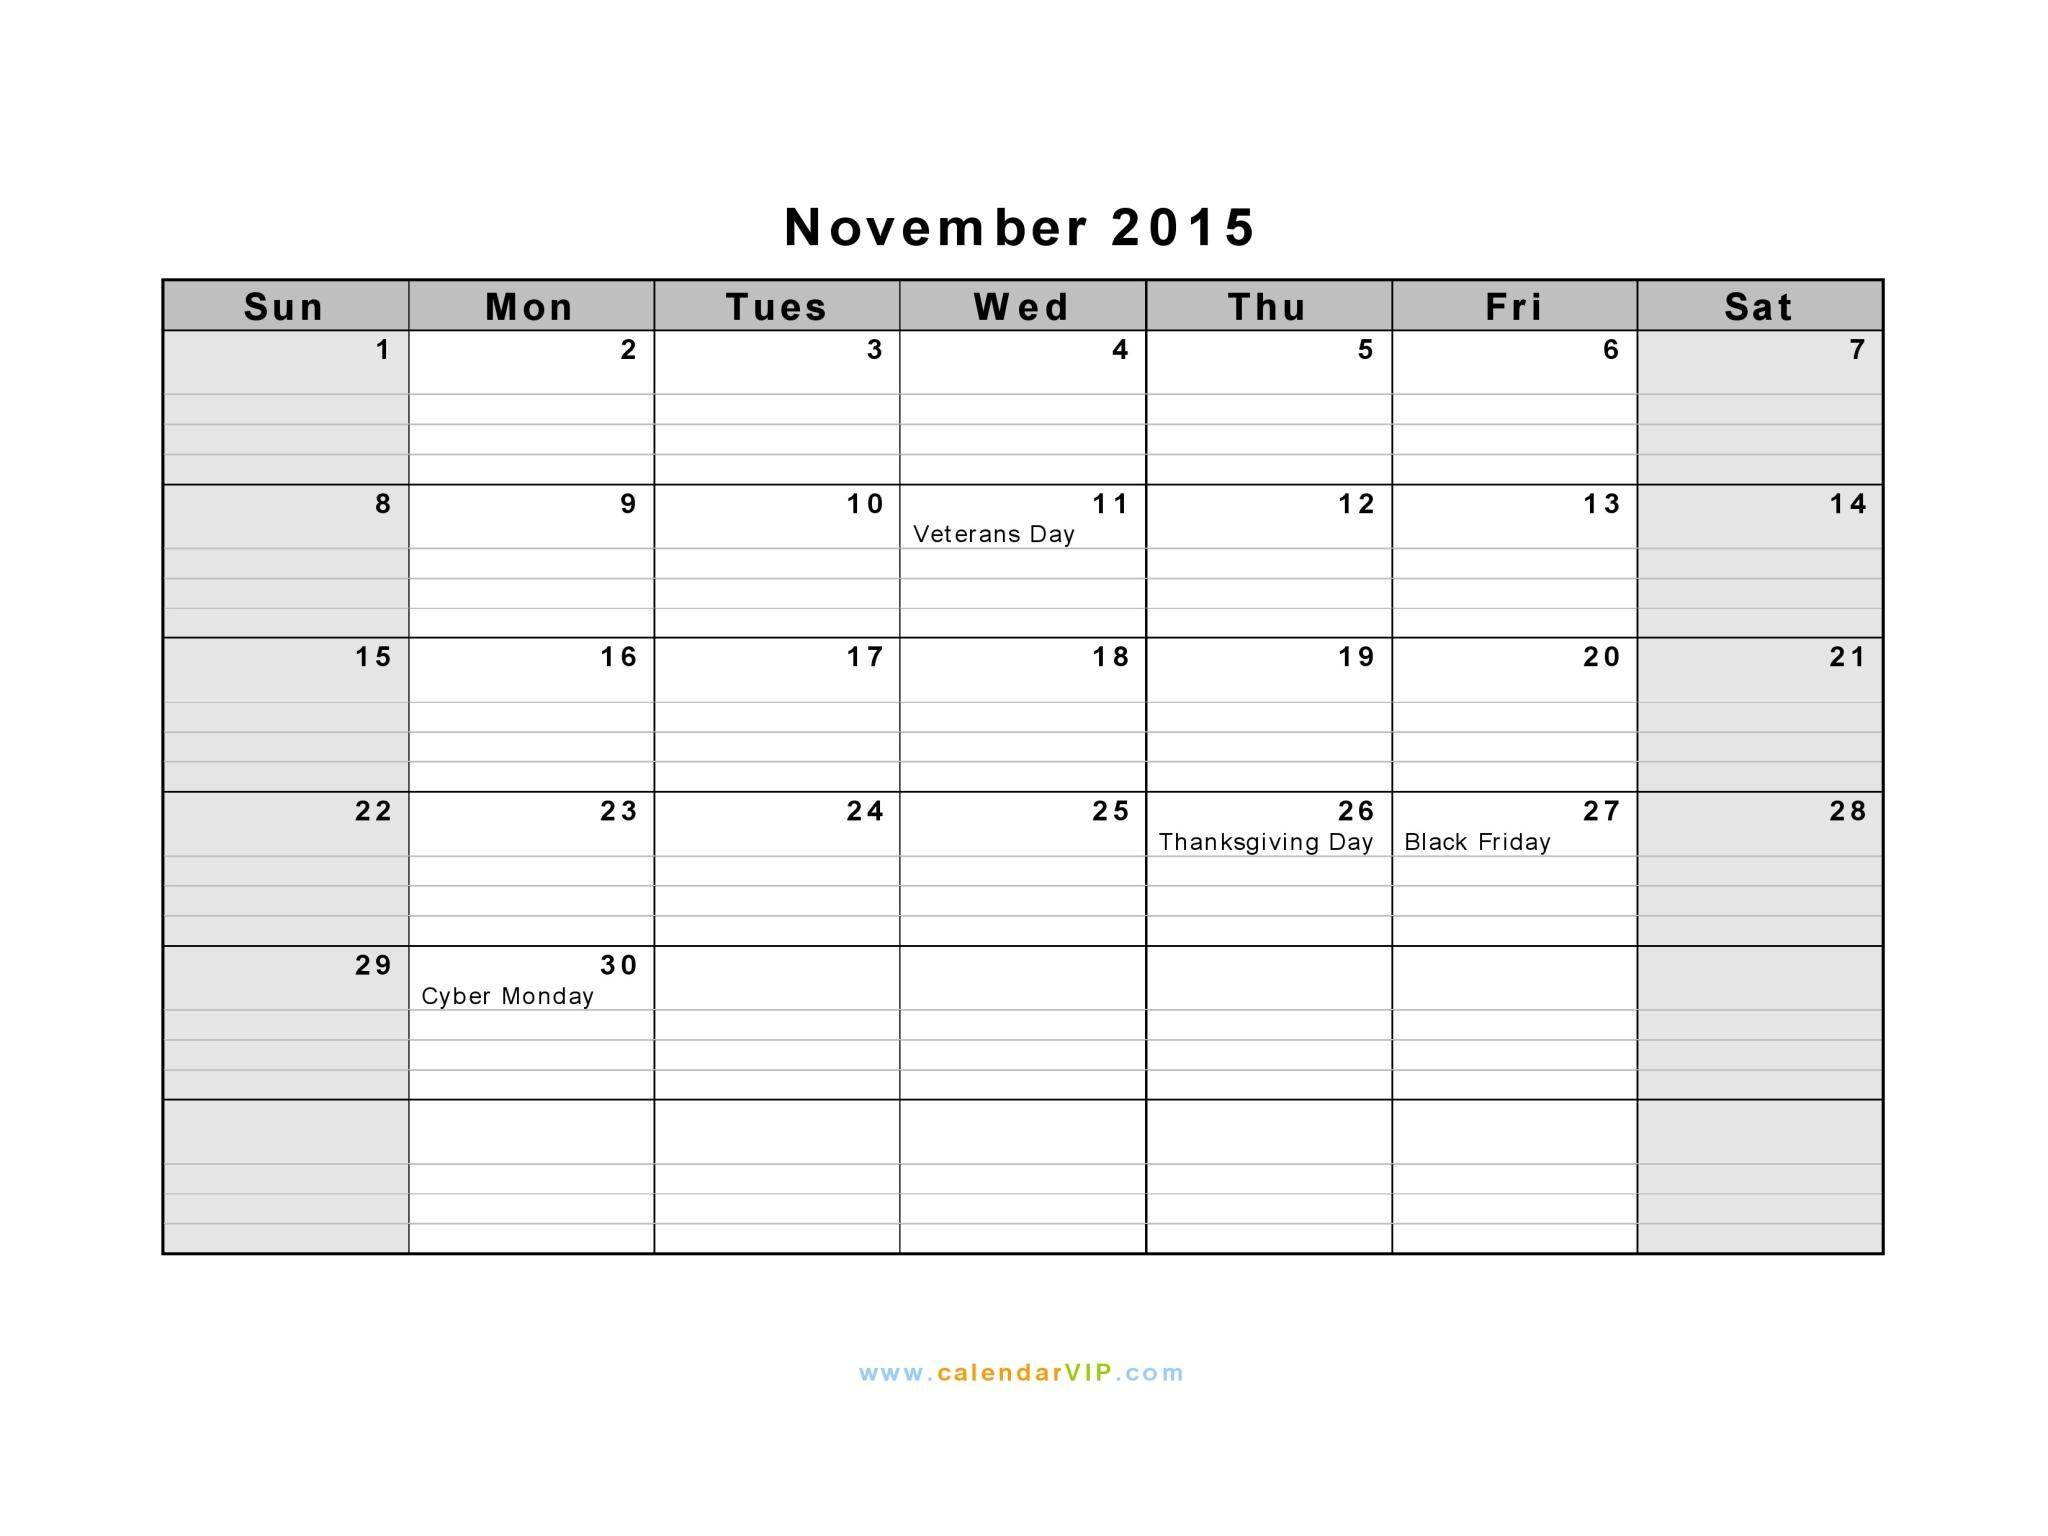 November 2015 Calendar - Blank Printable Calendar Template in PDF ...